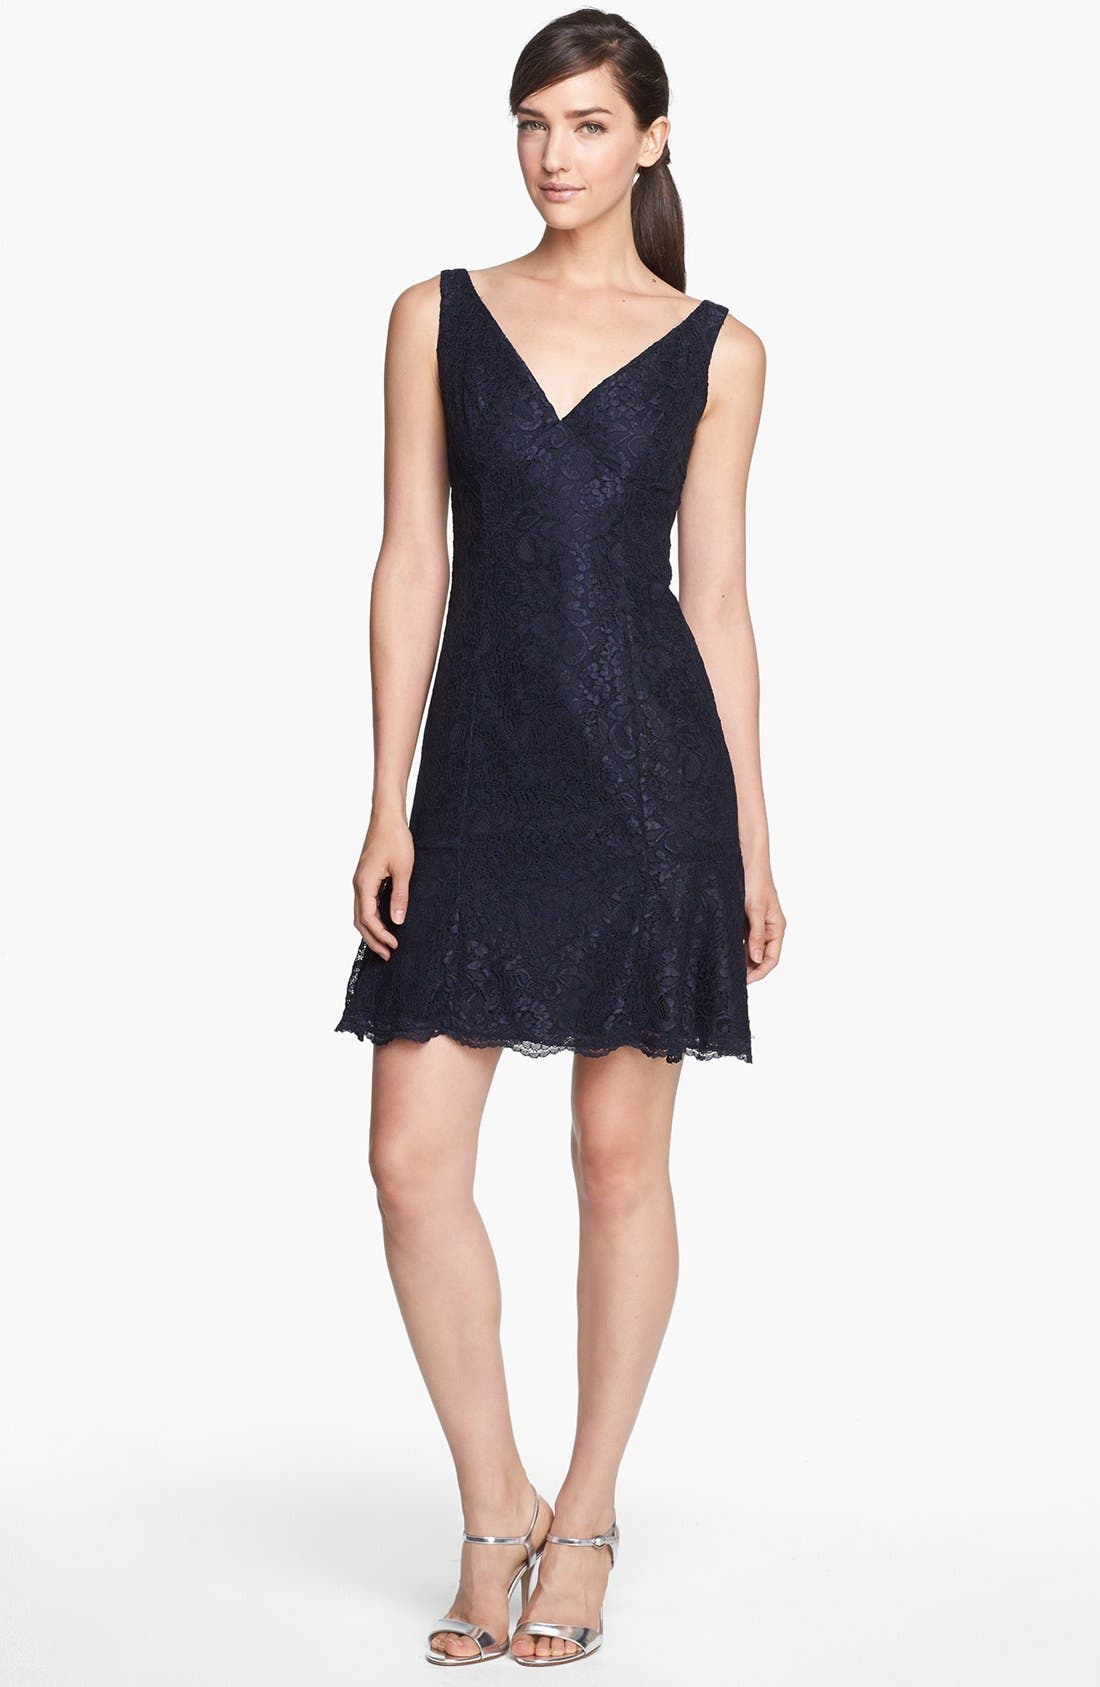 Alternate Image 1 Selected - ML Monique Lhuillier Bridesmaids Ruffle Hem Lace Dress (Nordstrom Exclusive)